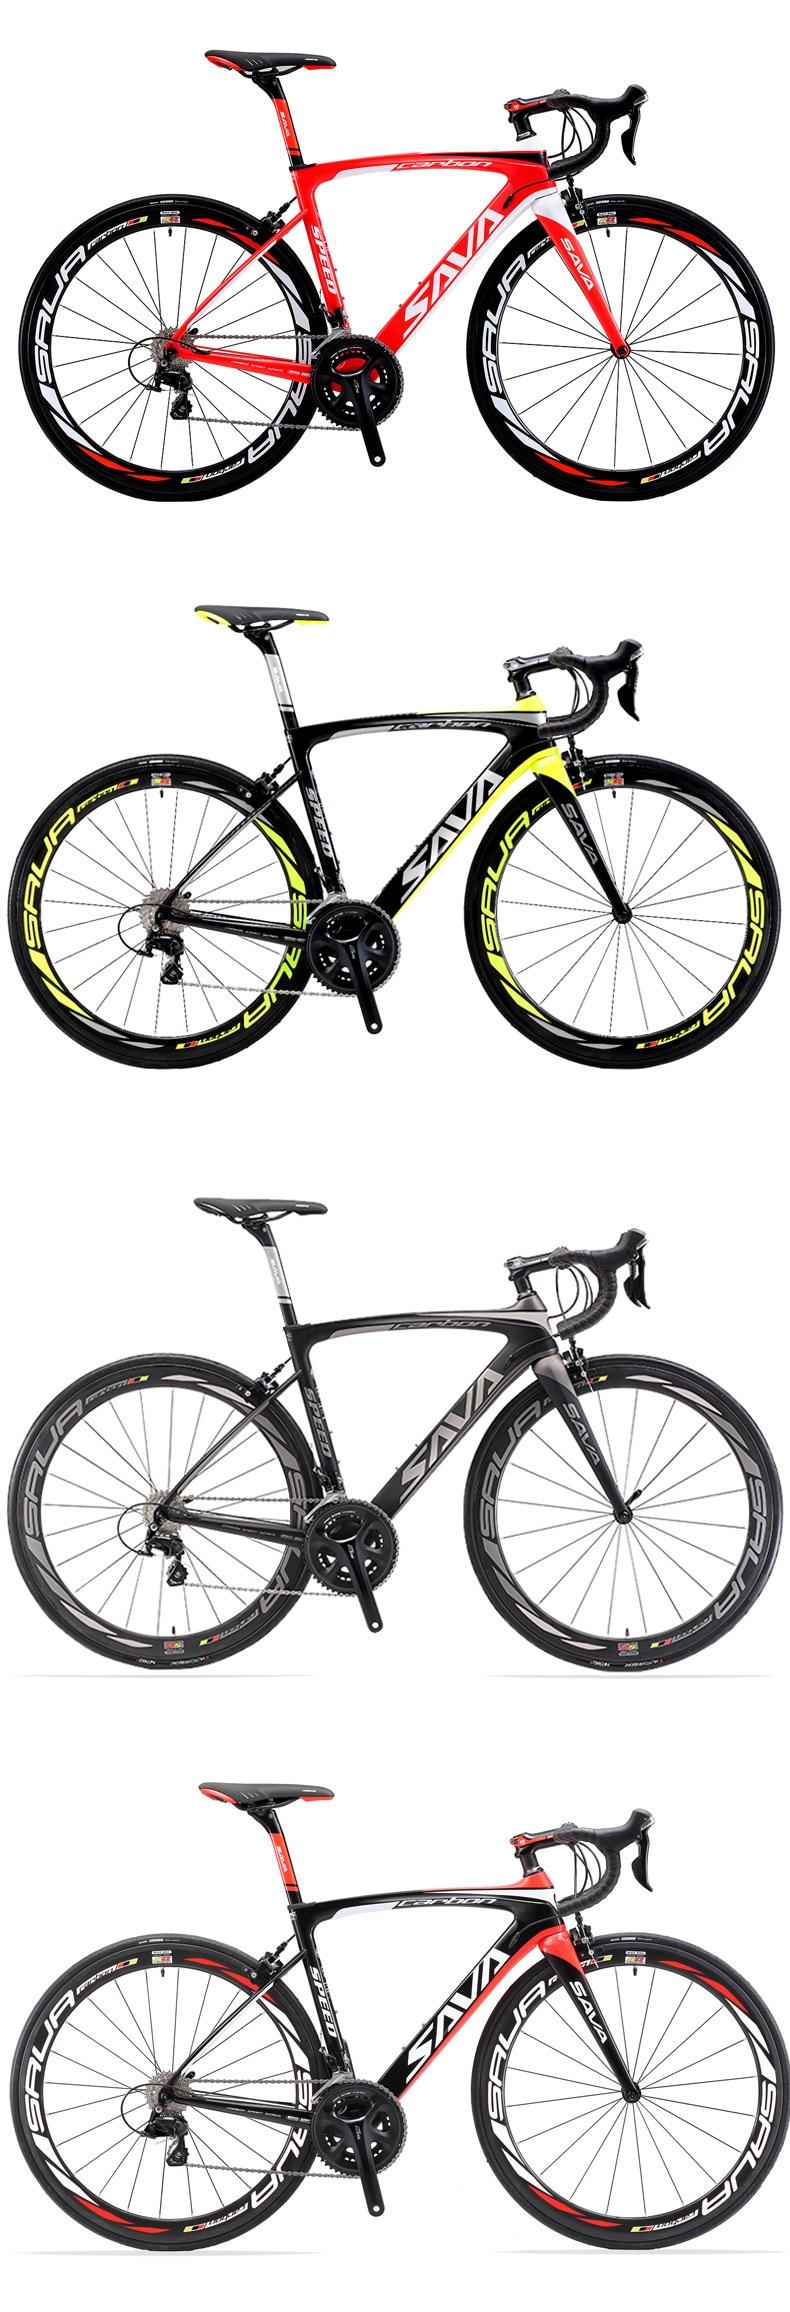 Carbon Road bike 700C Race Road Bike Carbon 8.4kg Bicycle Carbon Full Carbon Bicycle Racing with Shimano 105 R7000 Racing Bike